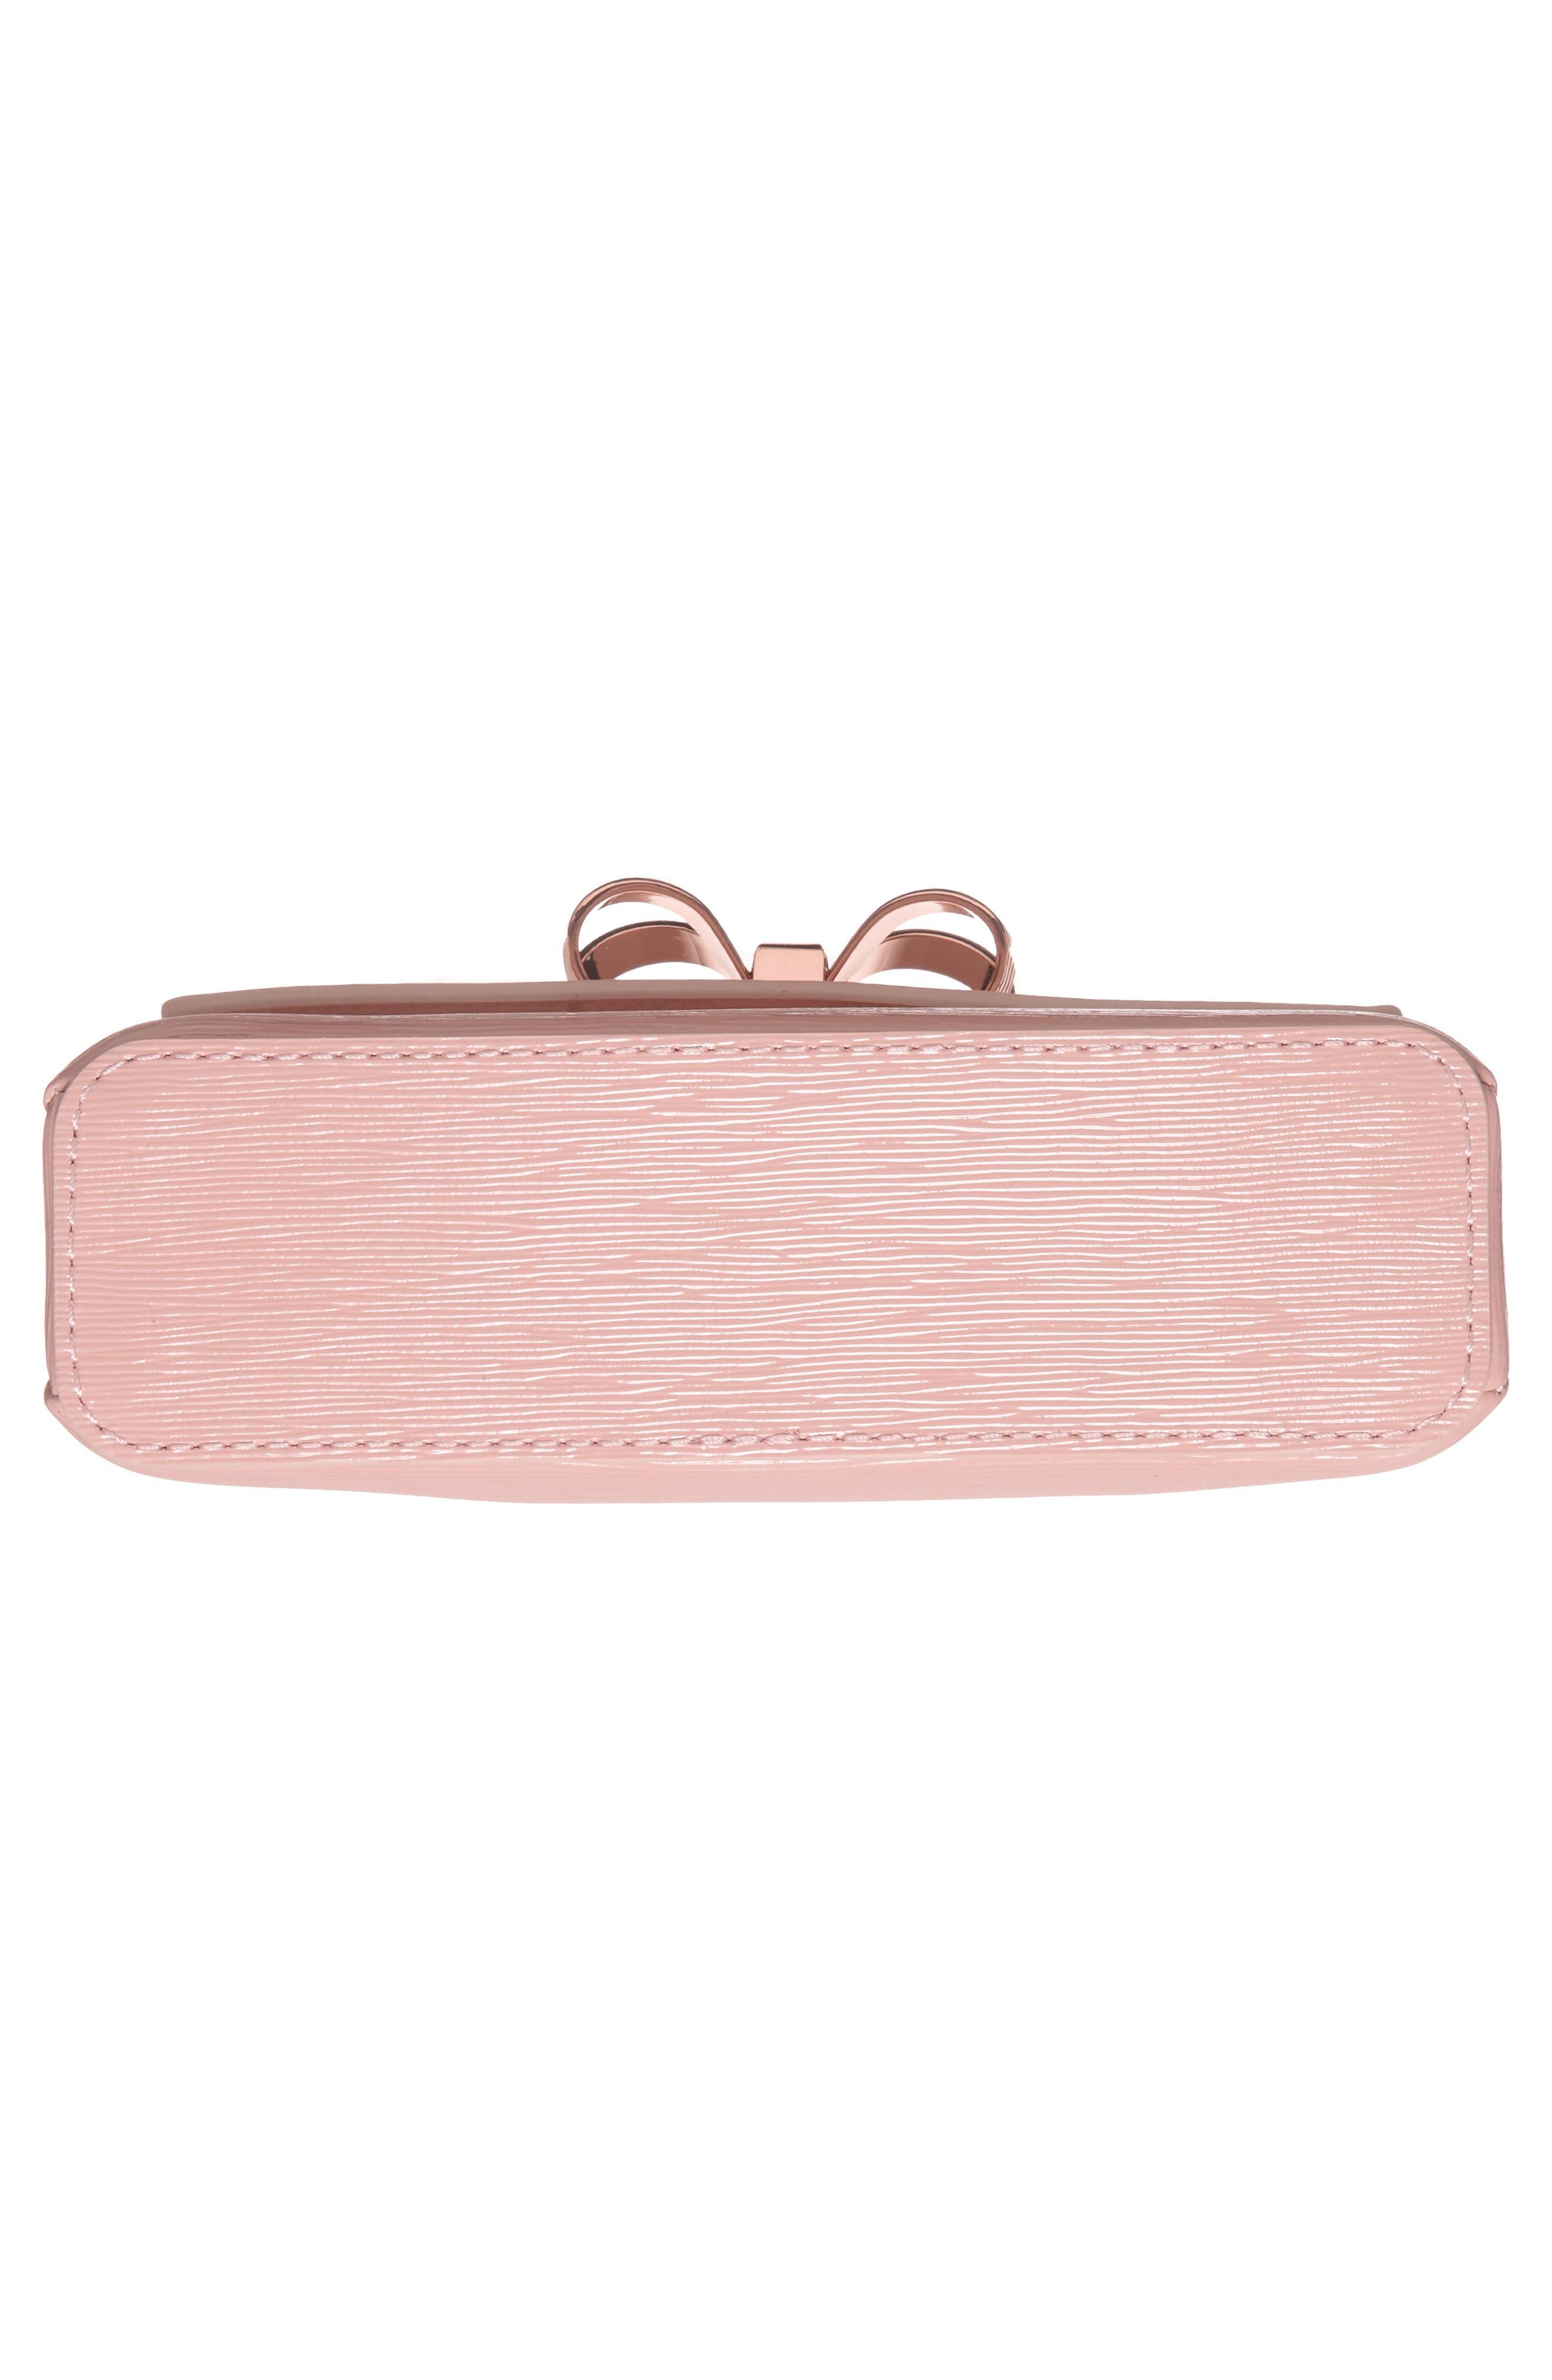 Loopa Bow Mini Leather Crossbody Bag,                             Alternate thumbnail 6, color,                             Light Pink